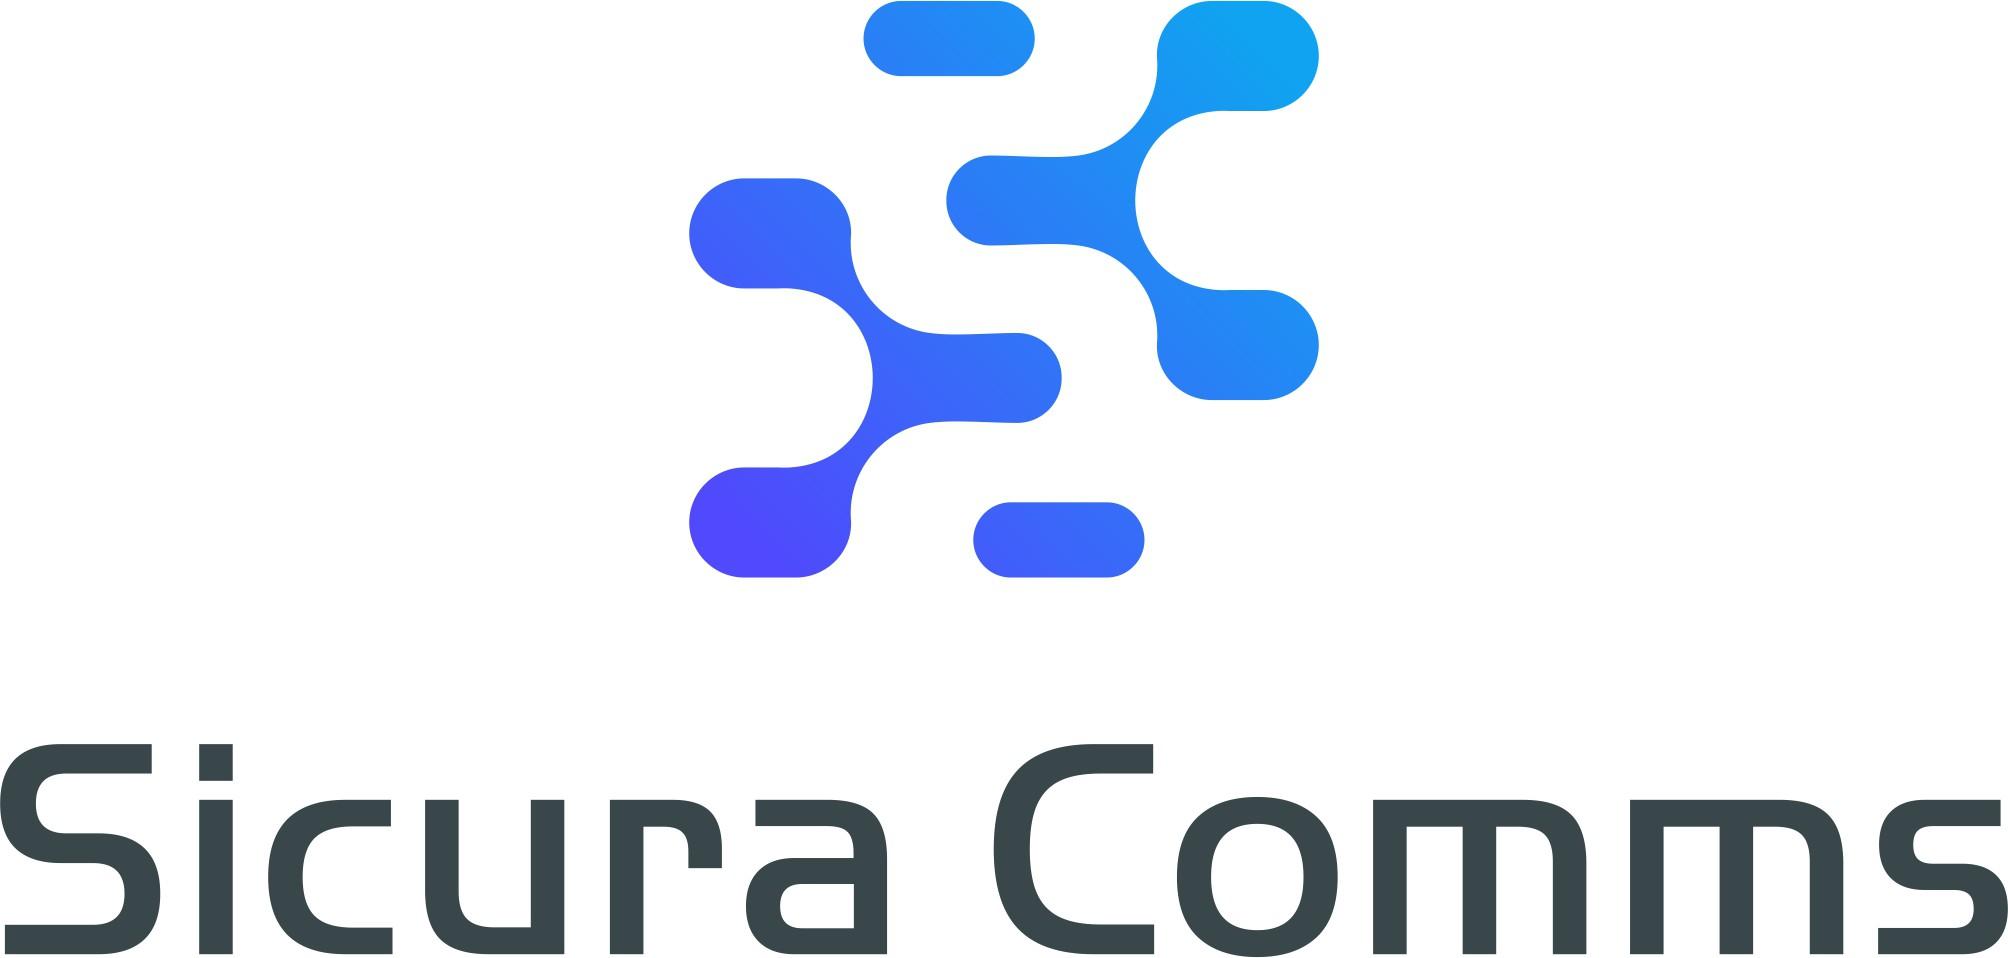 Design a sleek and modern logo for a leading Australian Telecomms provider